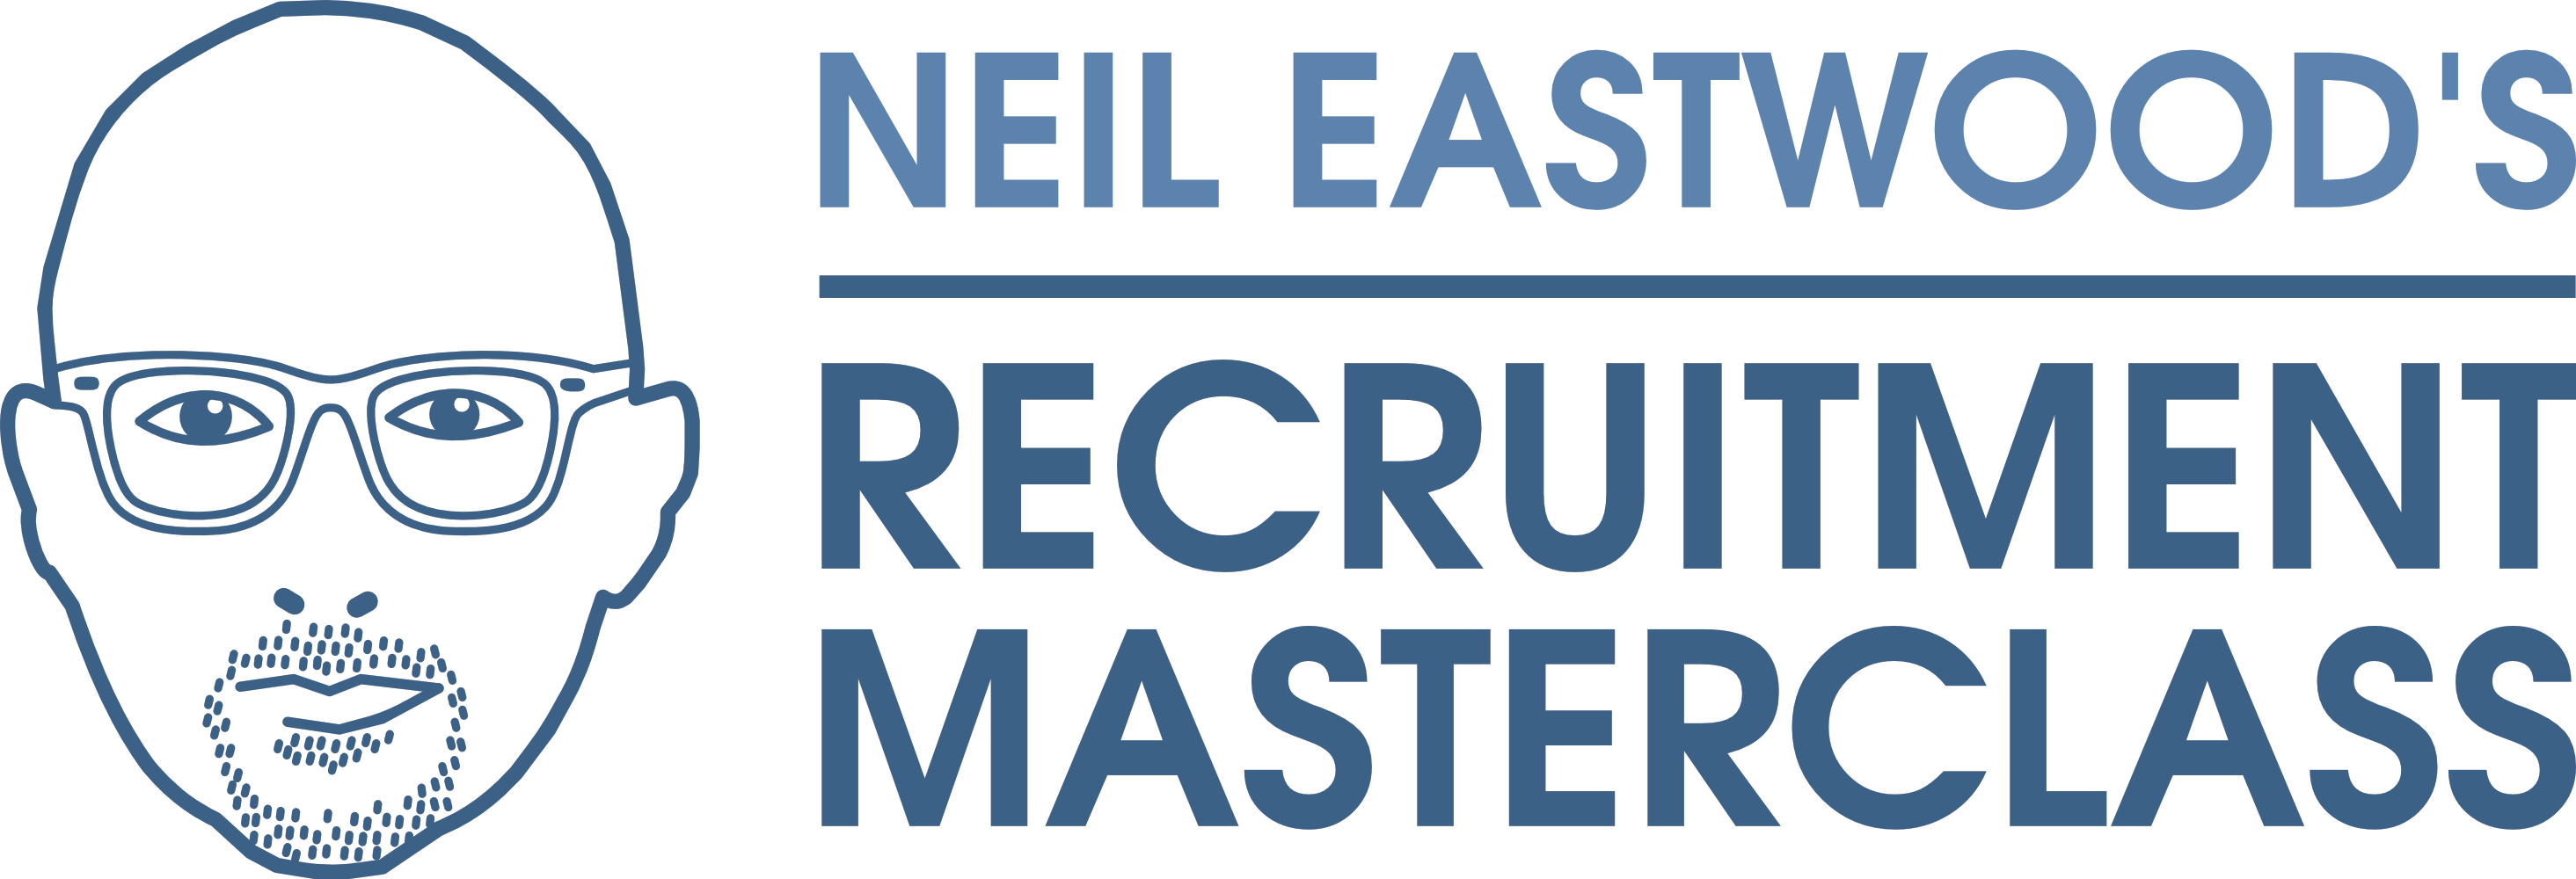 Neil Eastwood's Recruitment Masterclass